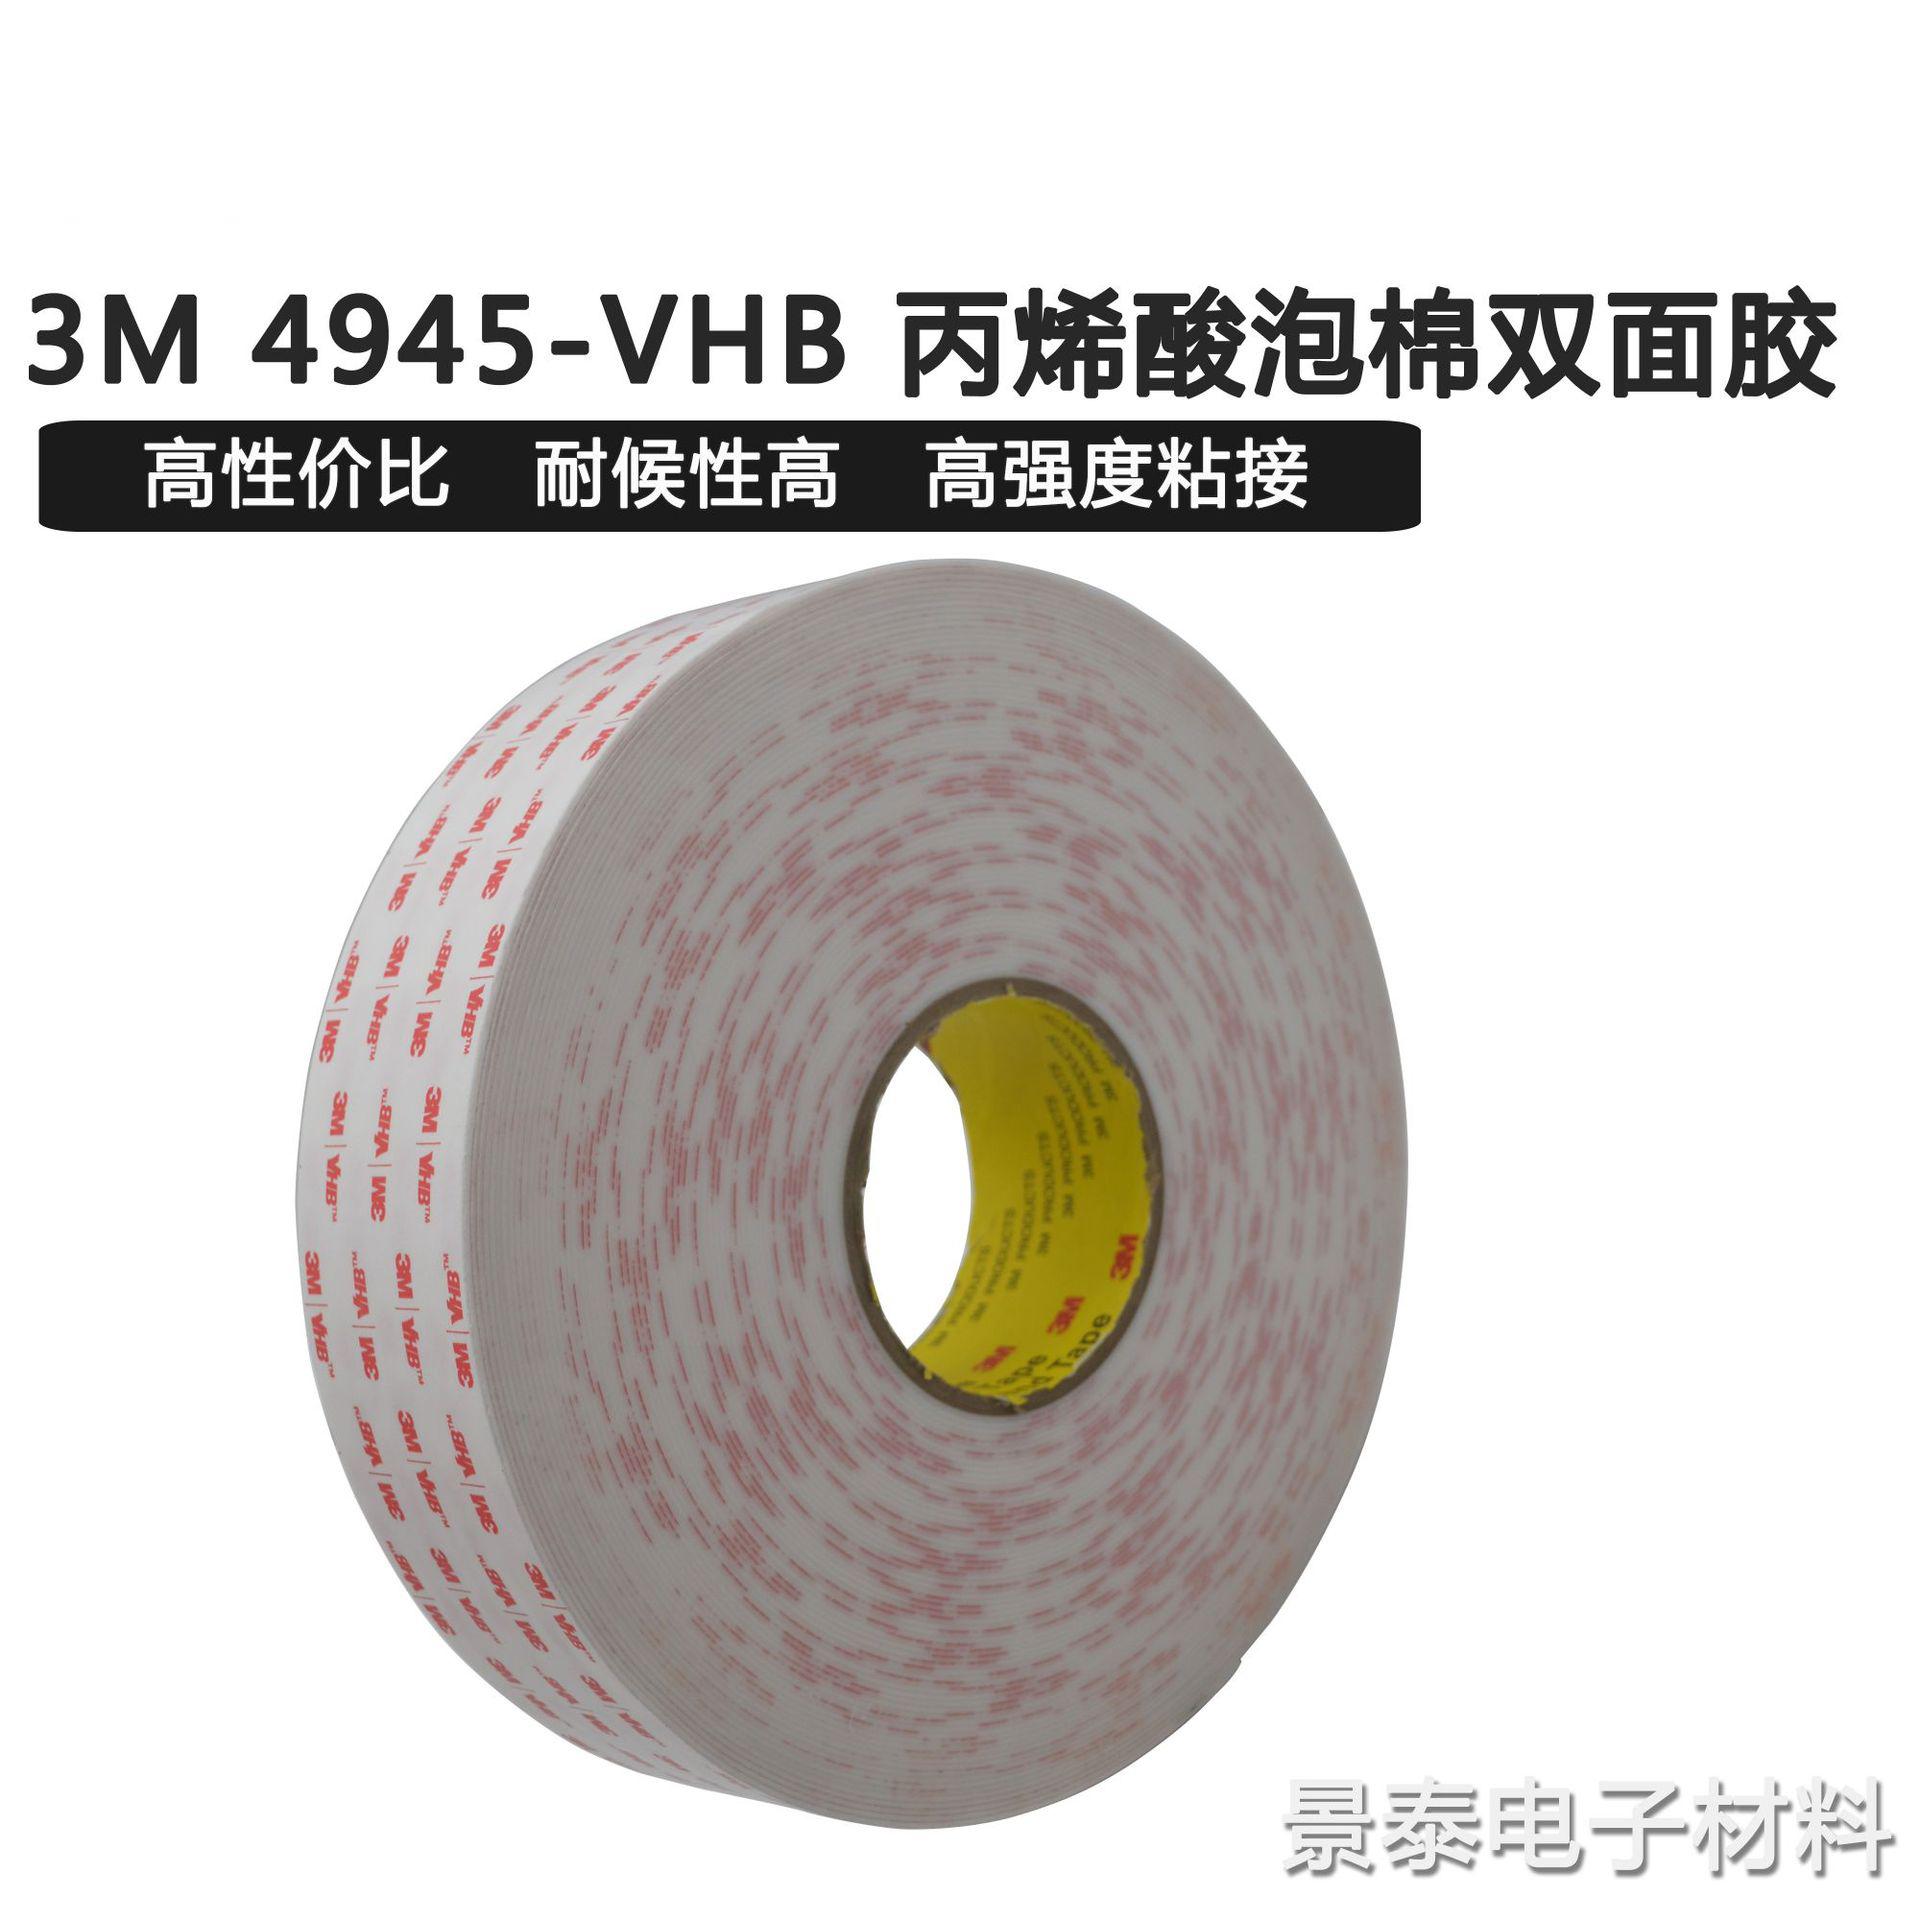 3m 4945丙烯酸双面胶